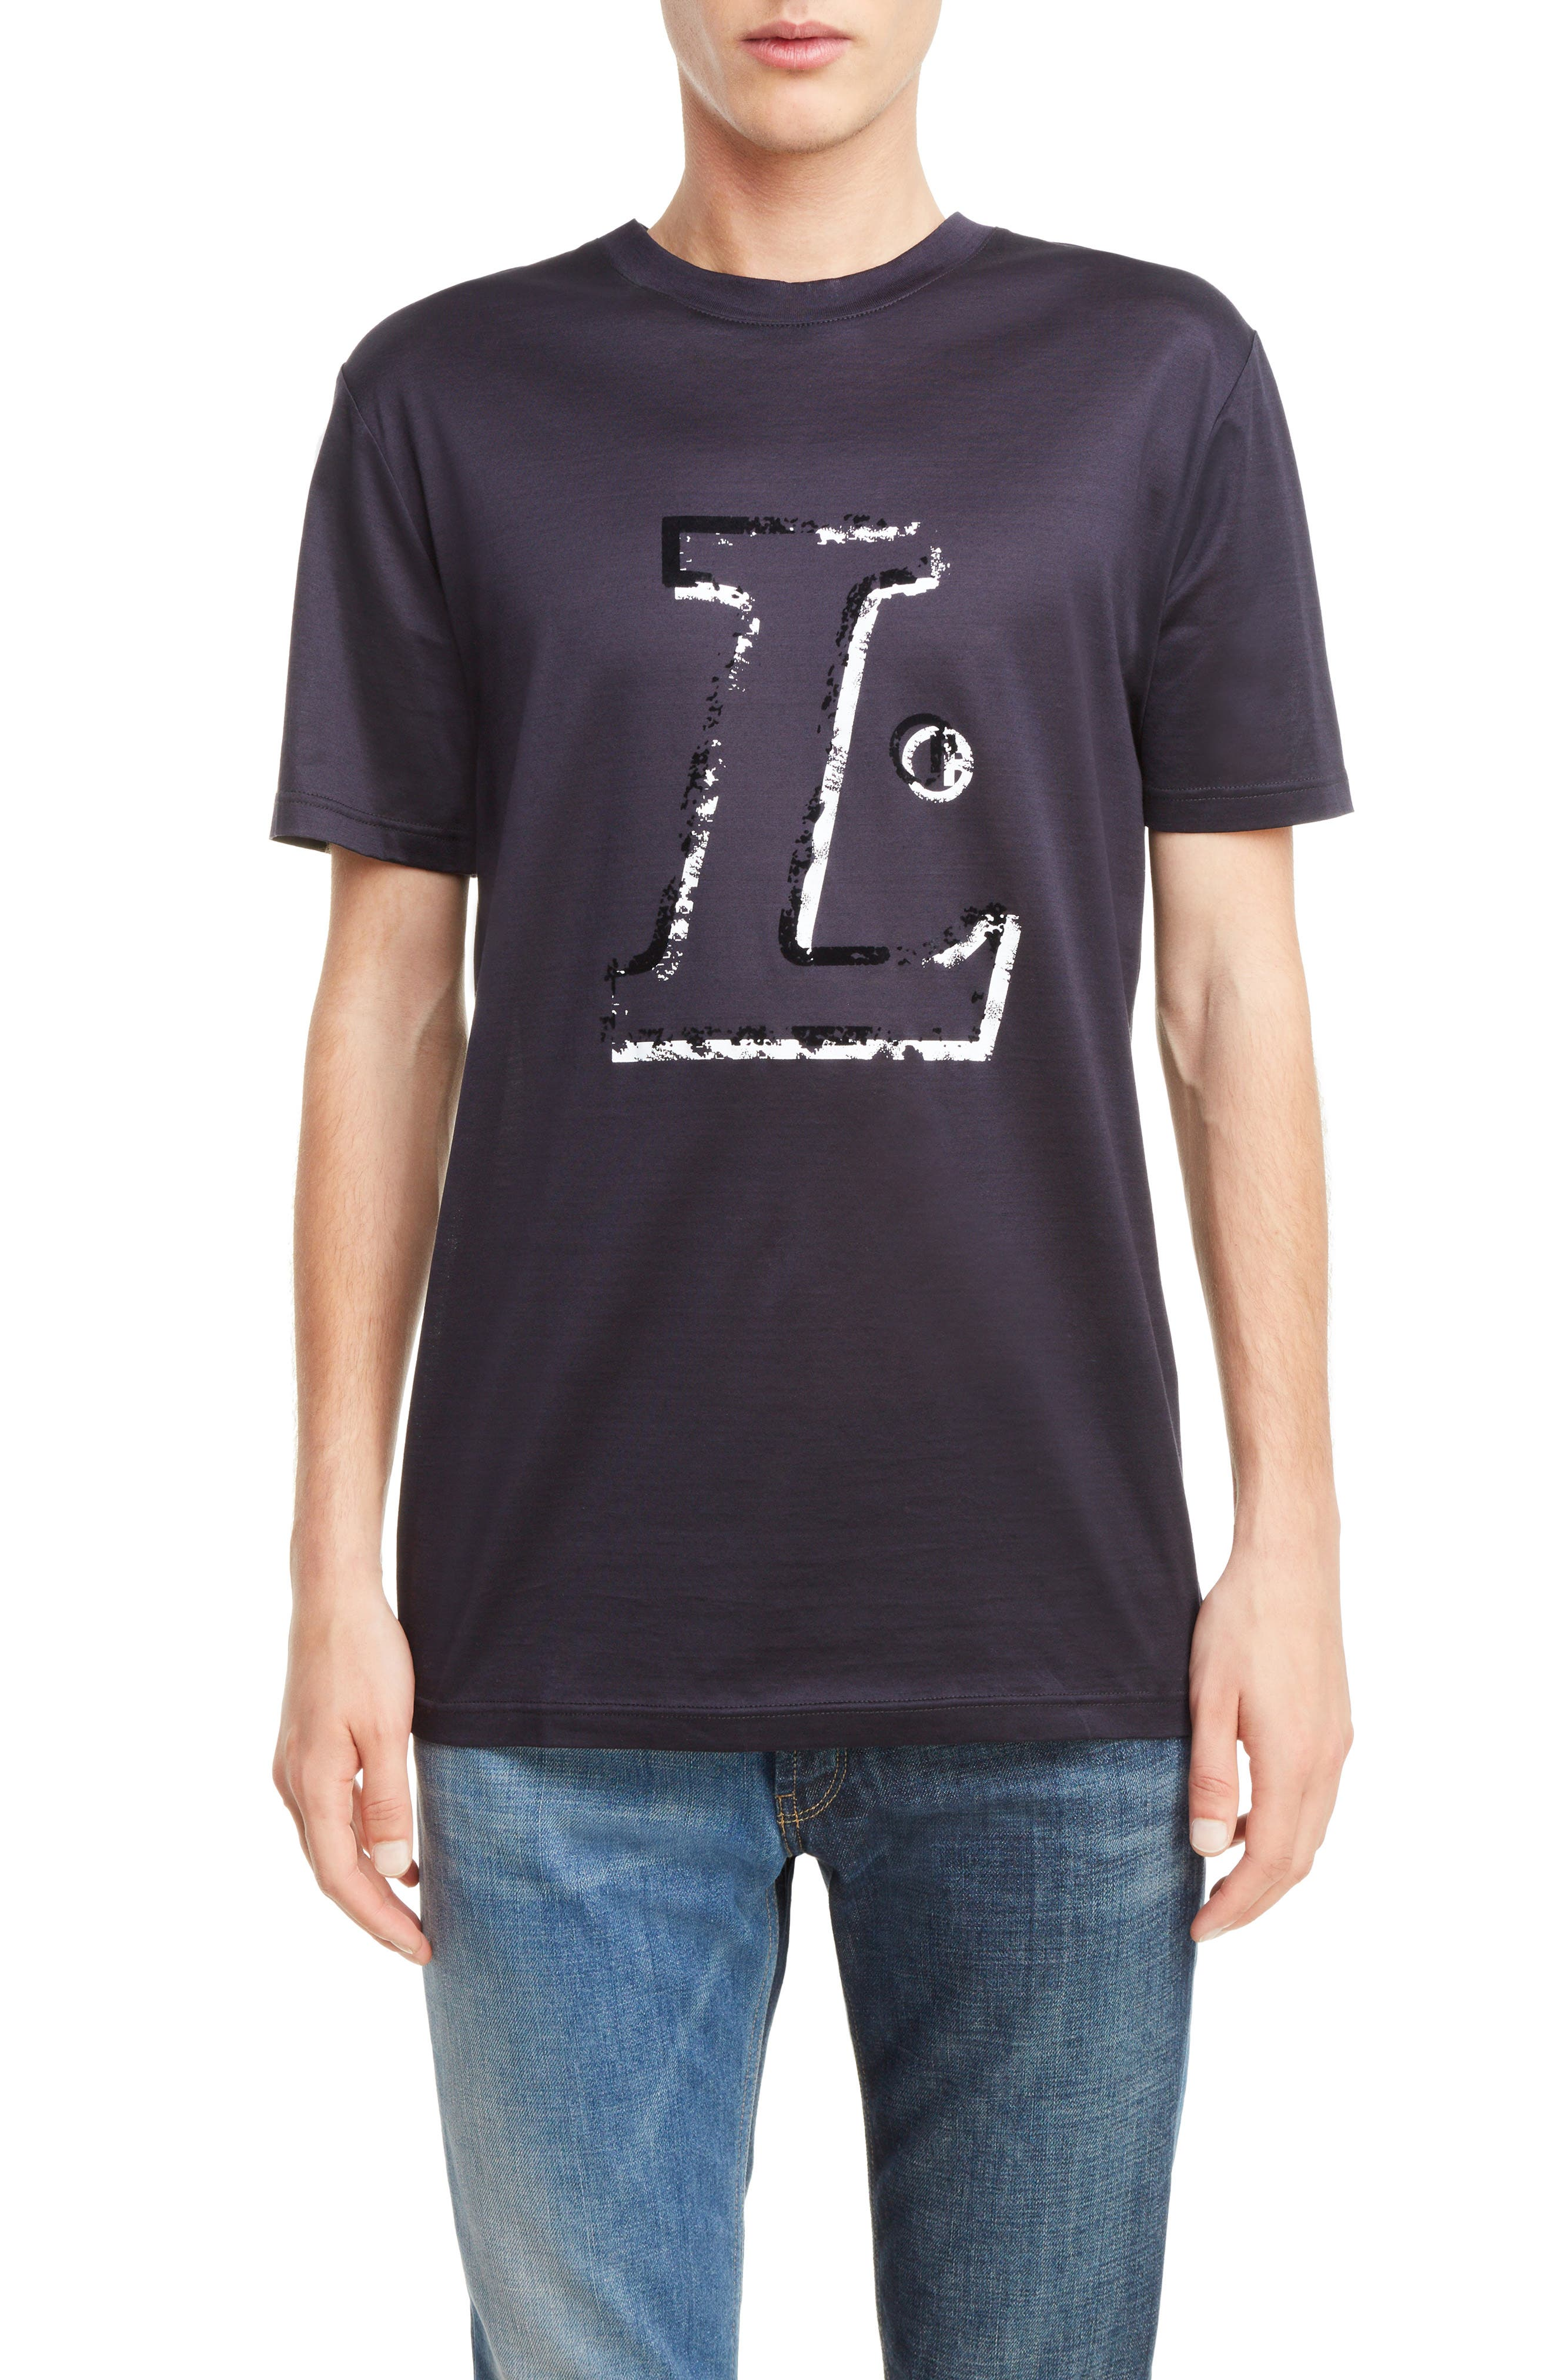 Main Image - Lanvin Graphic T-Shirt